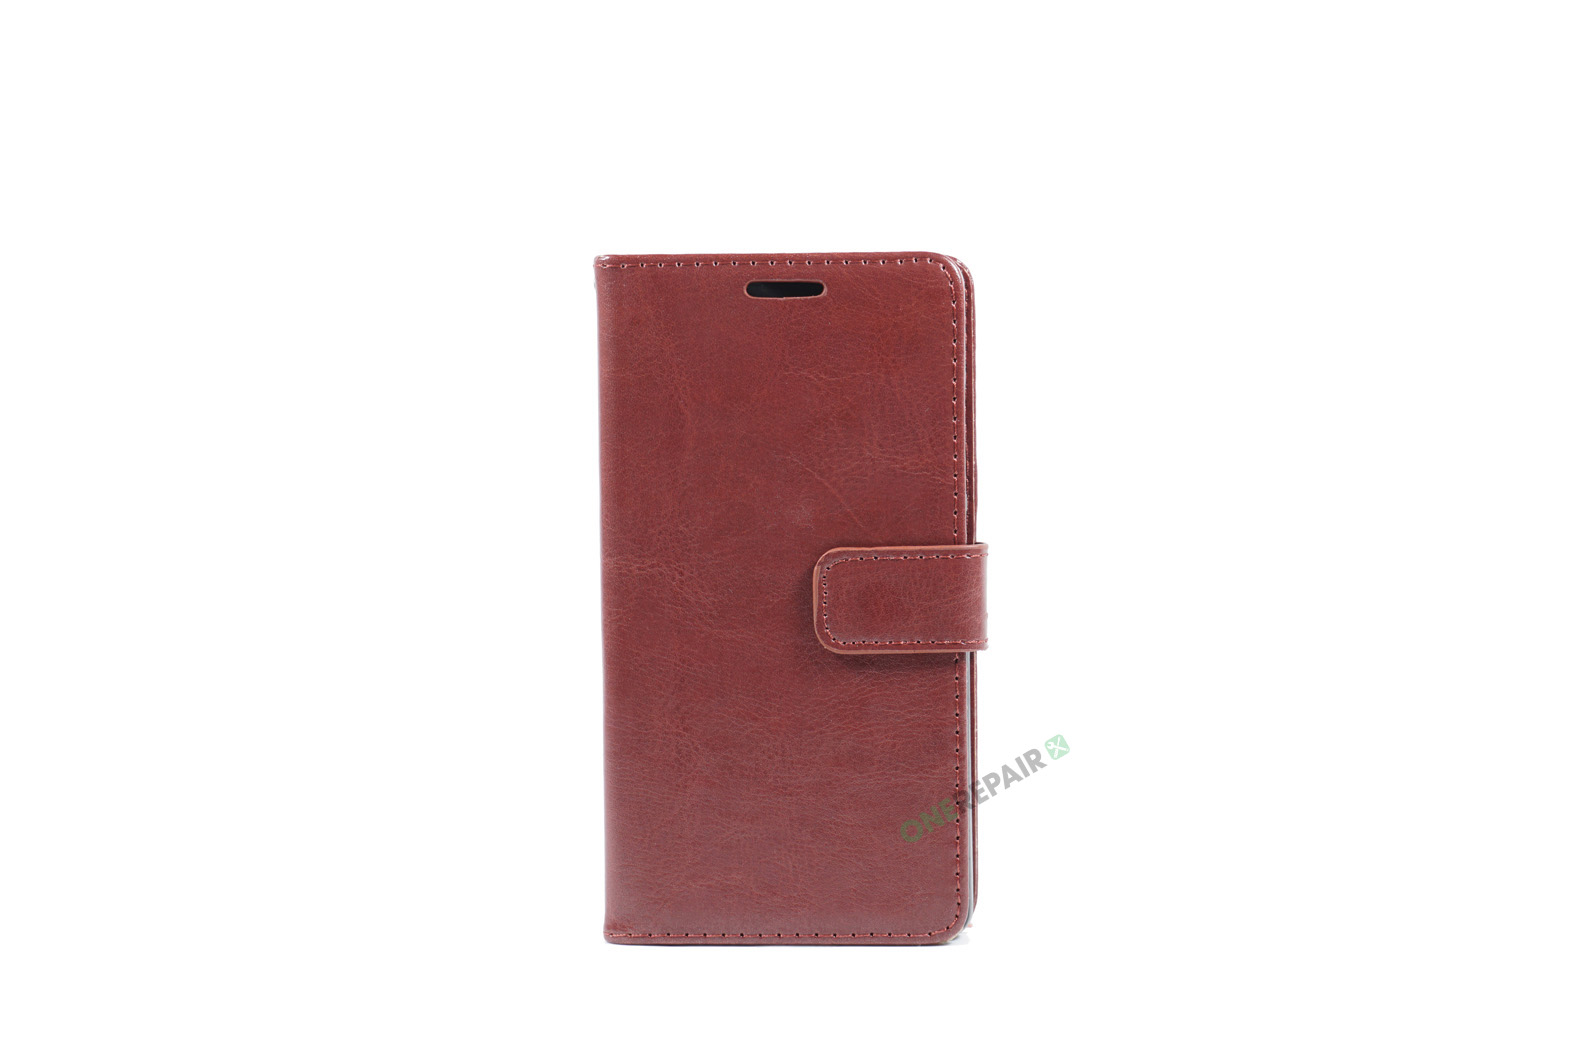 Huawei P8, Flipcover, cover, Plads til kort, Brun